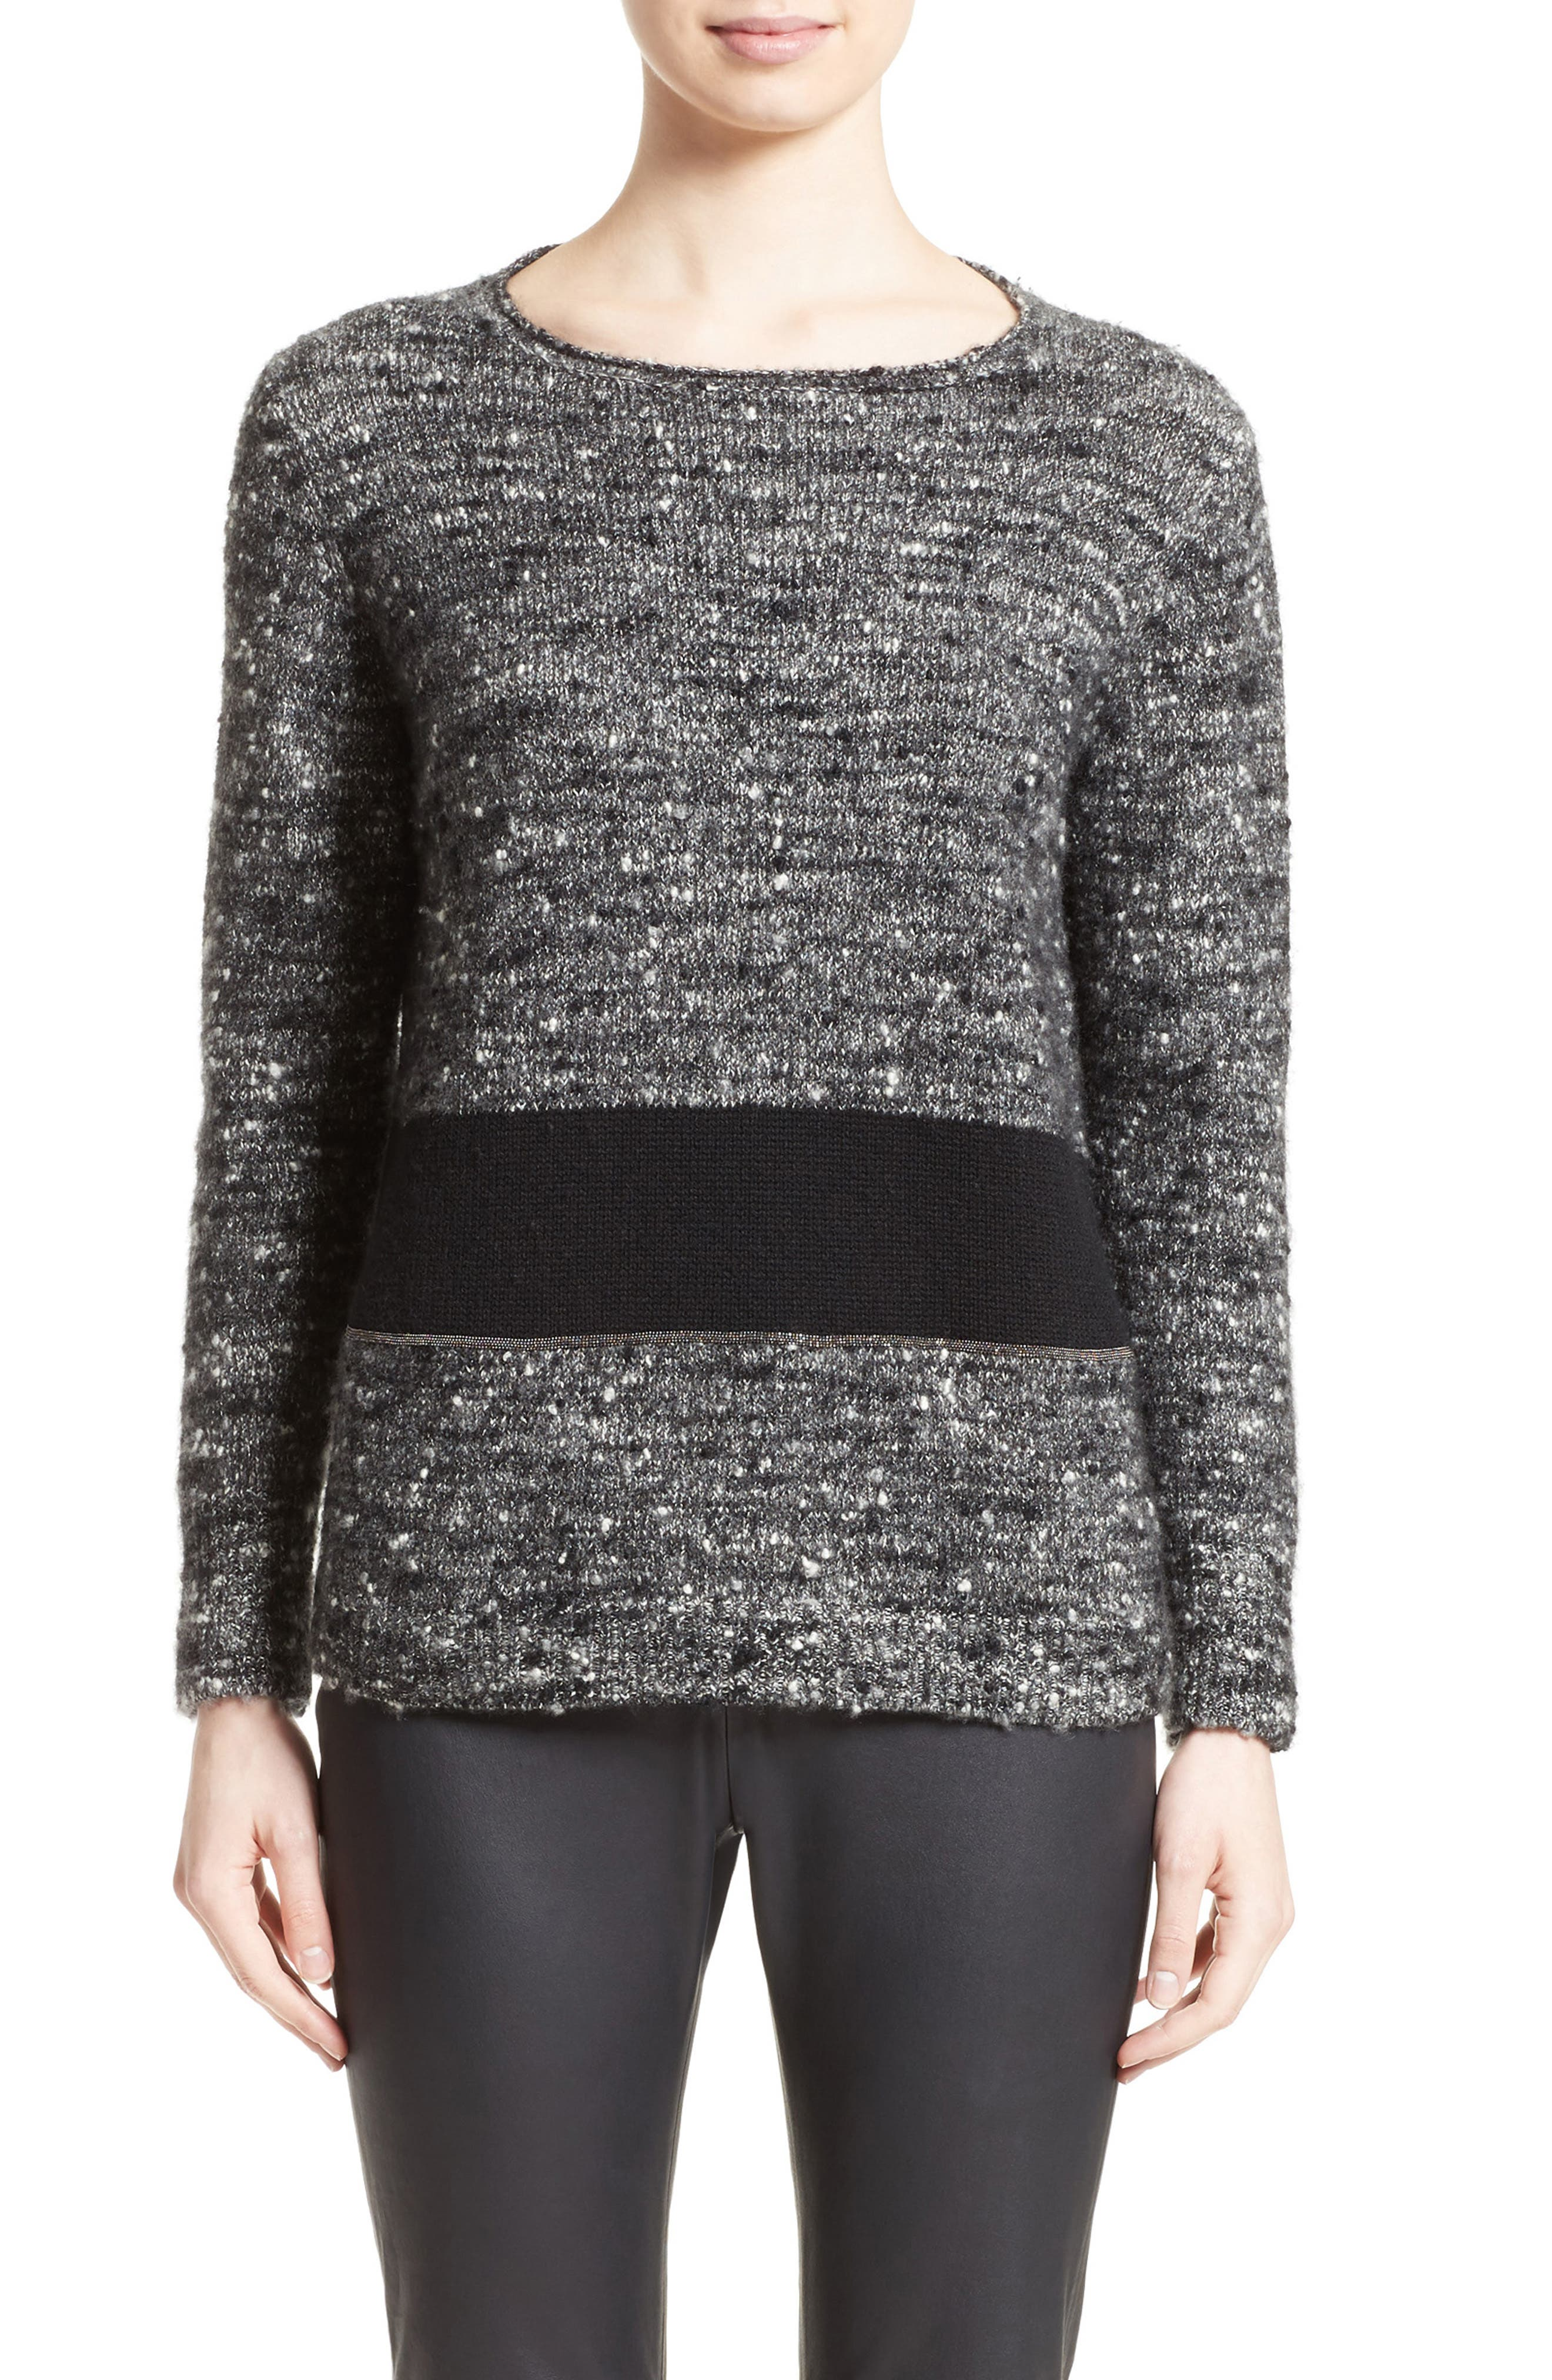 Alternate Image 1 Selected - Fabiana Filippi Cashmere & Silk Blend Tweed Pullover